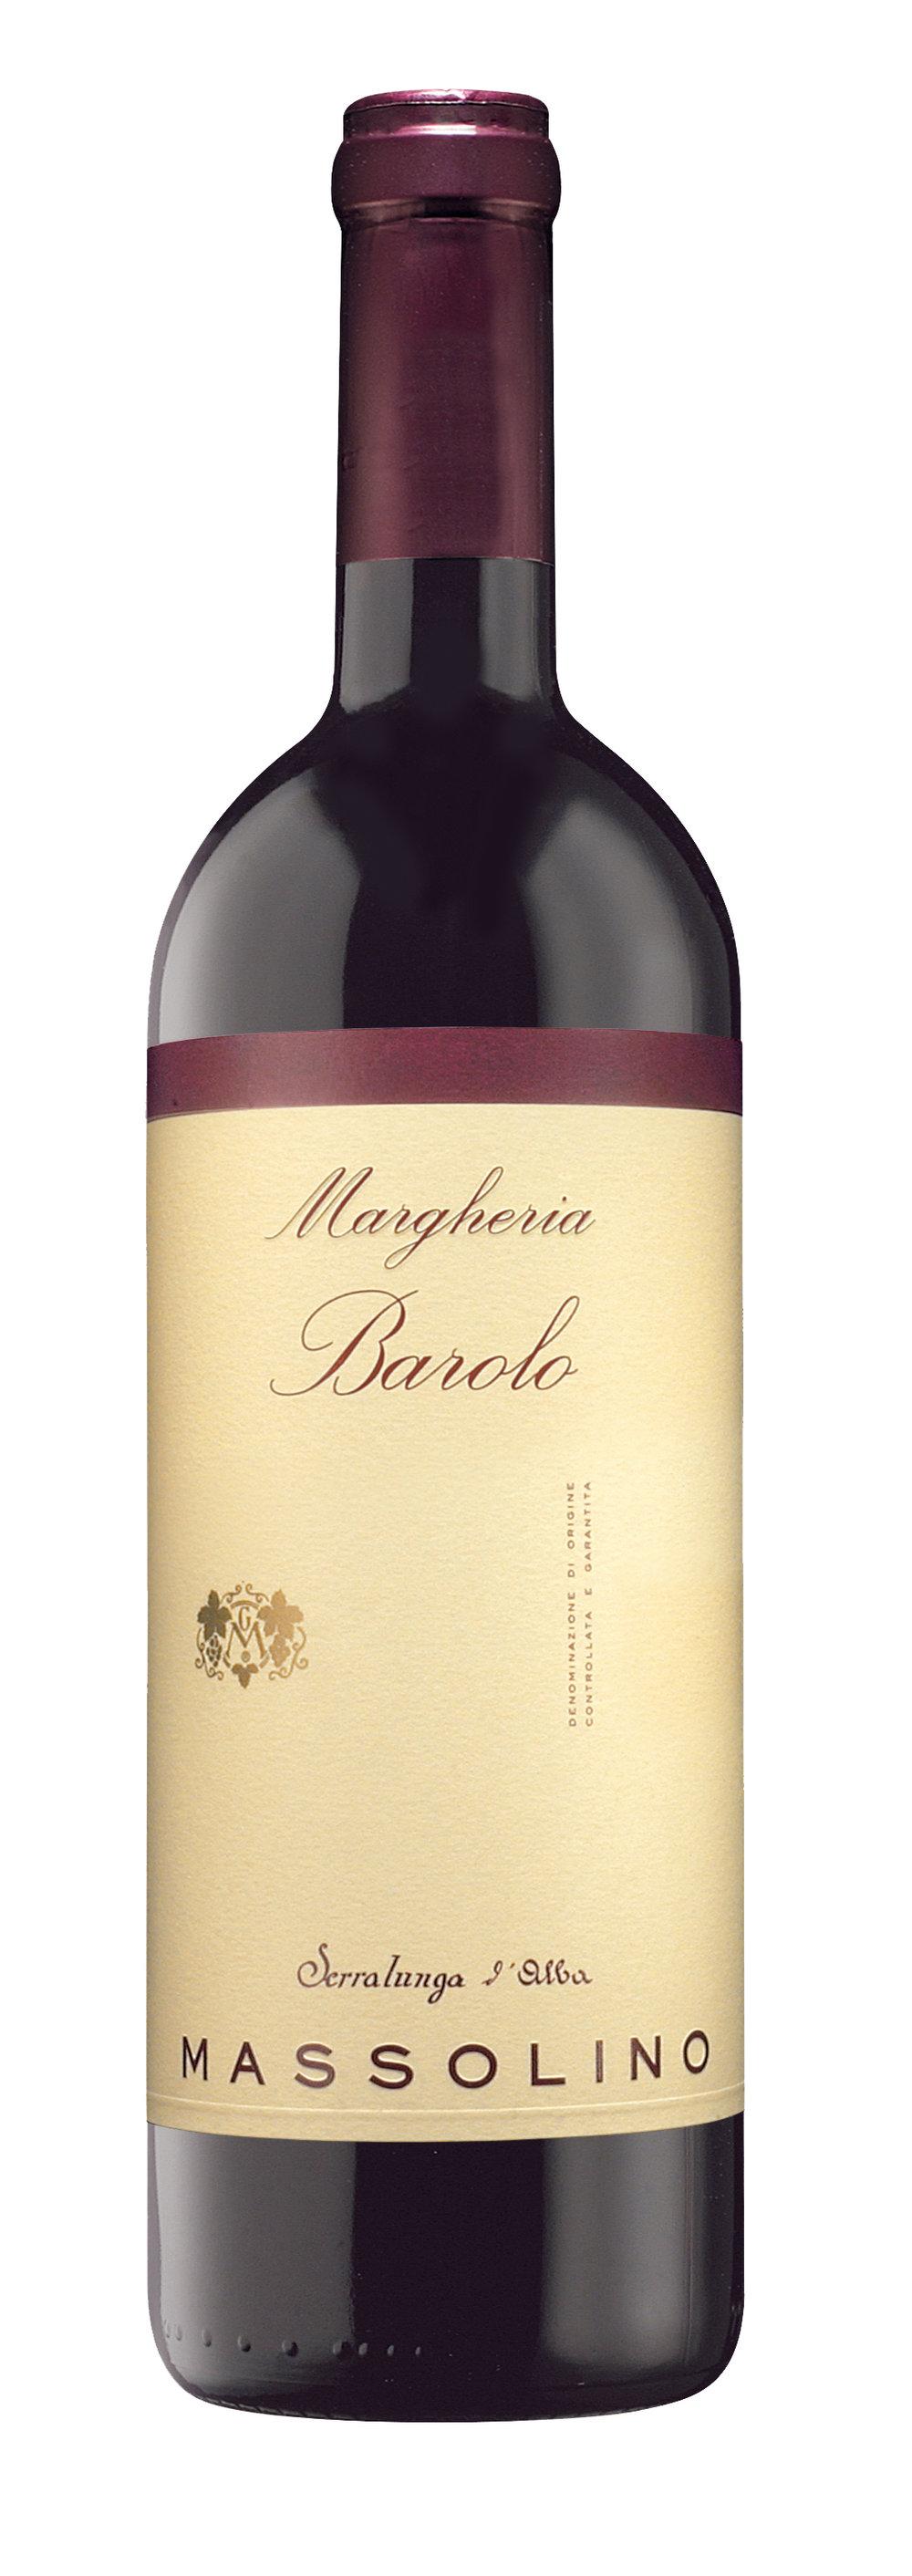 Massolino Margheria Barolo Bottle.jpg